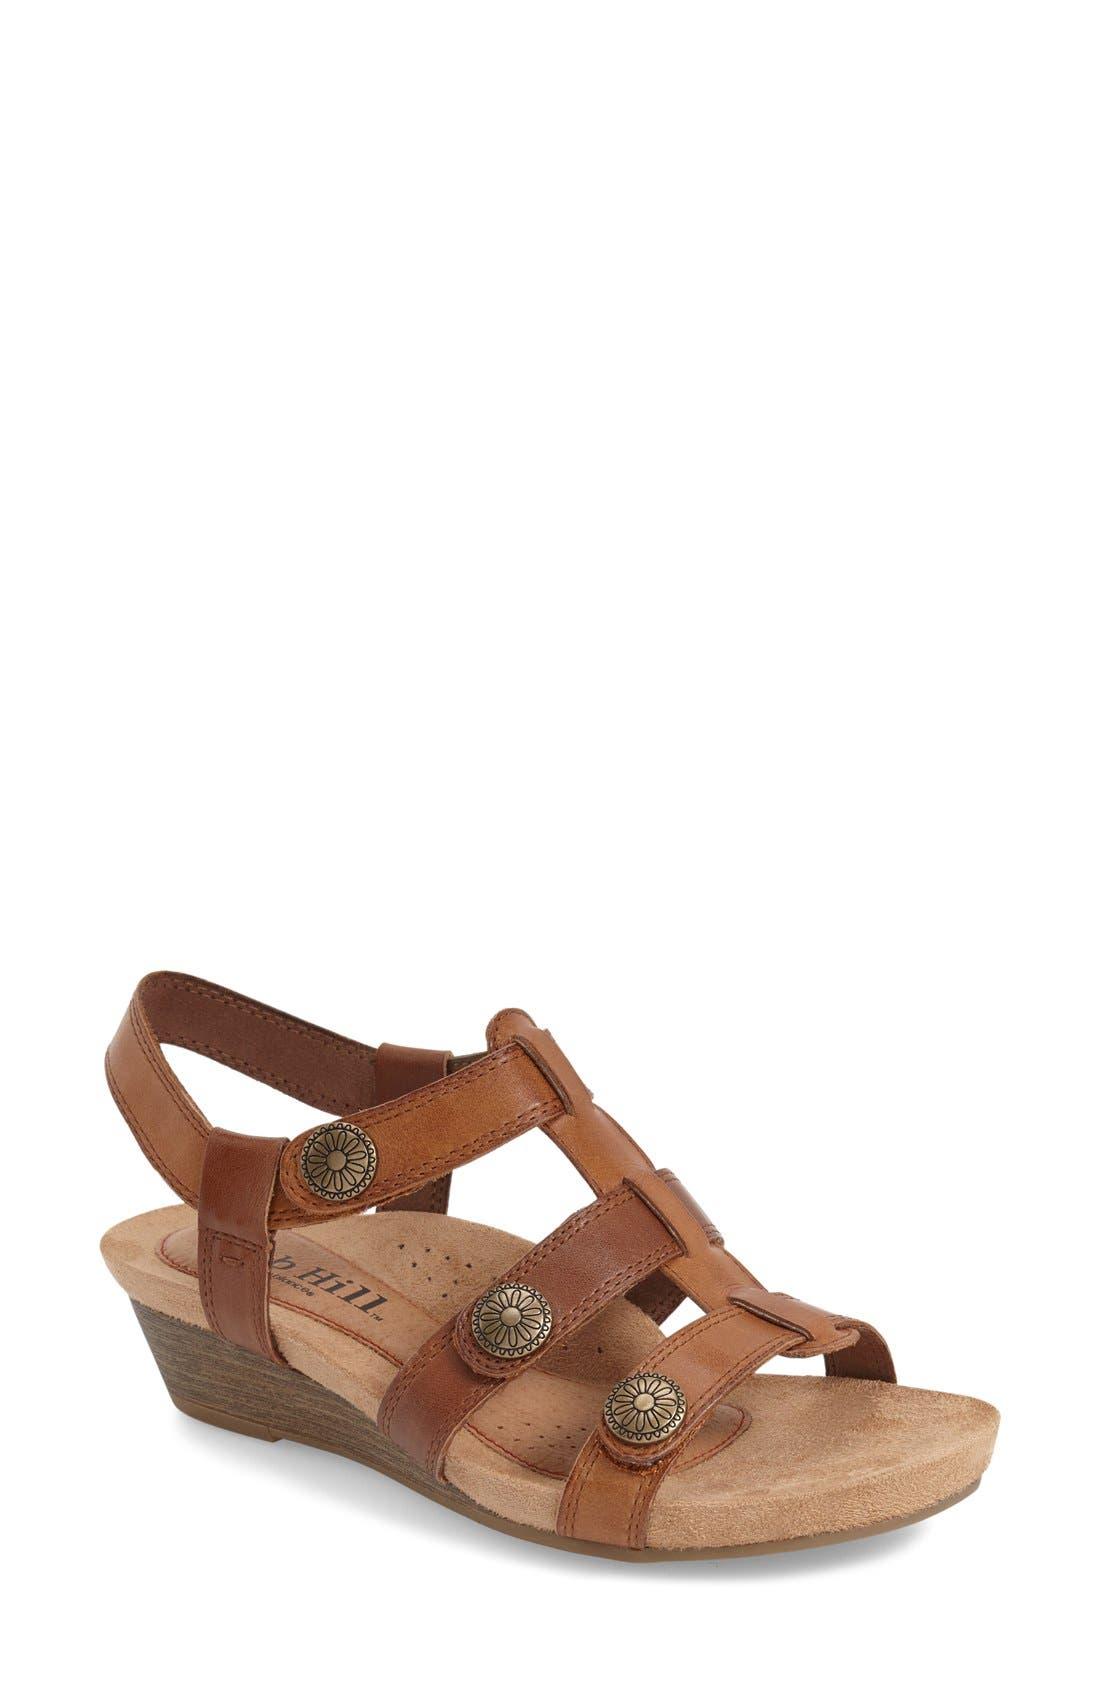 Main Image - Rockport Cobb Hill 'Harper' Wedge Sandal (Women)